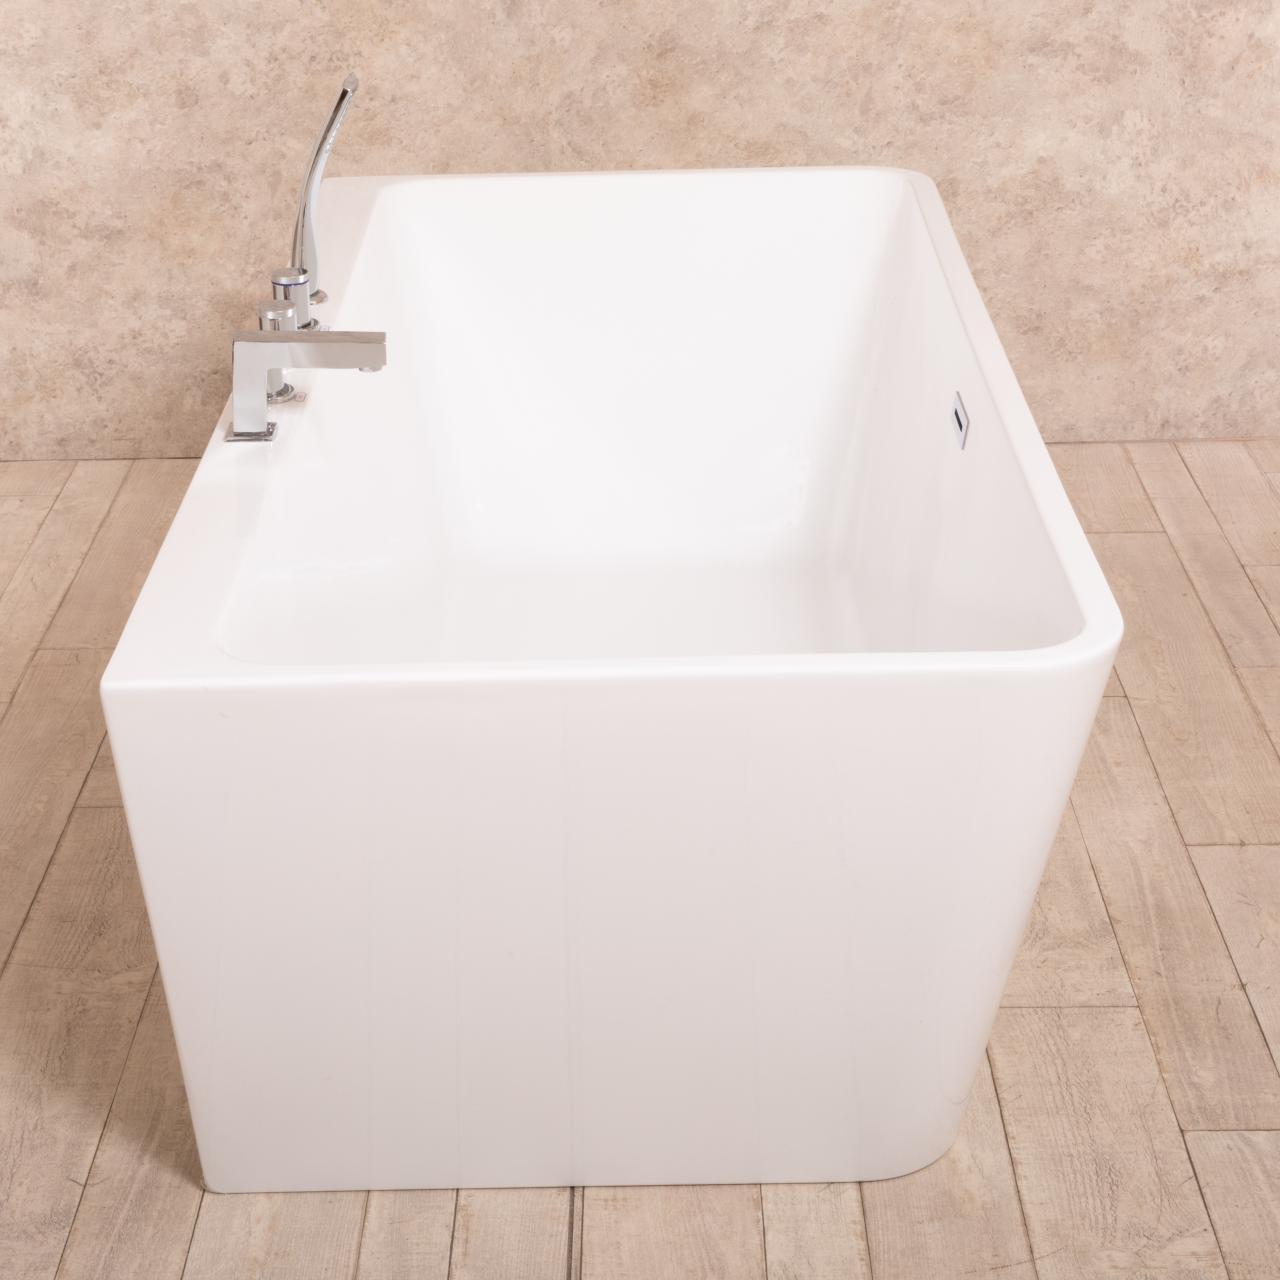 Vasca da bagno alba design moderno 170x82 cm cod 00001526 for Arredo bagno alba